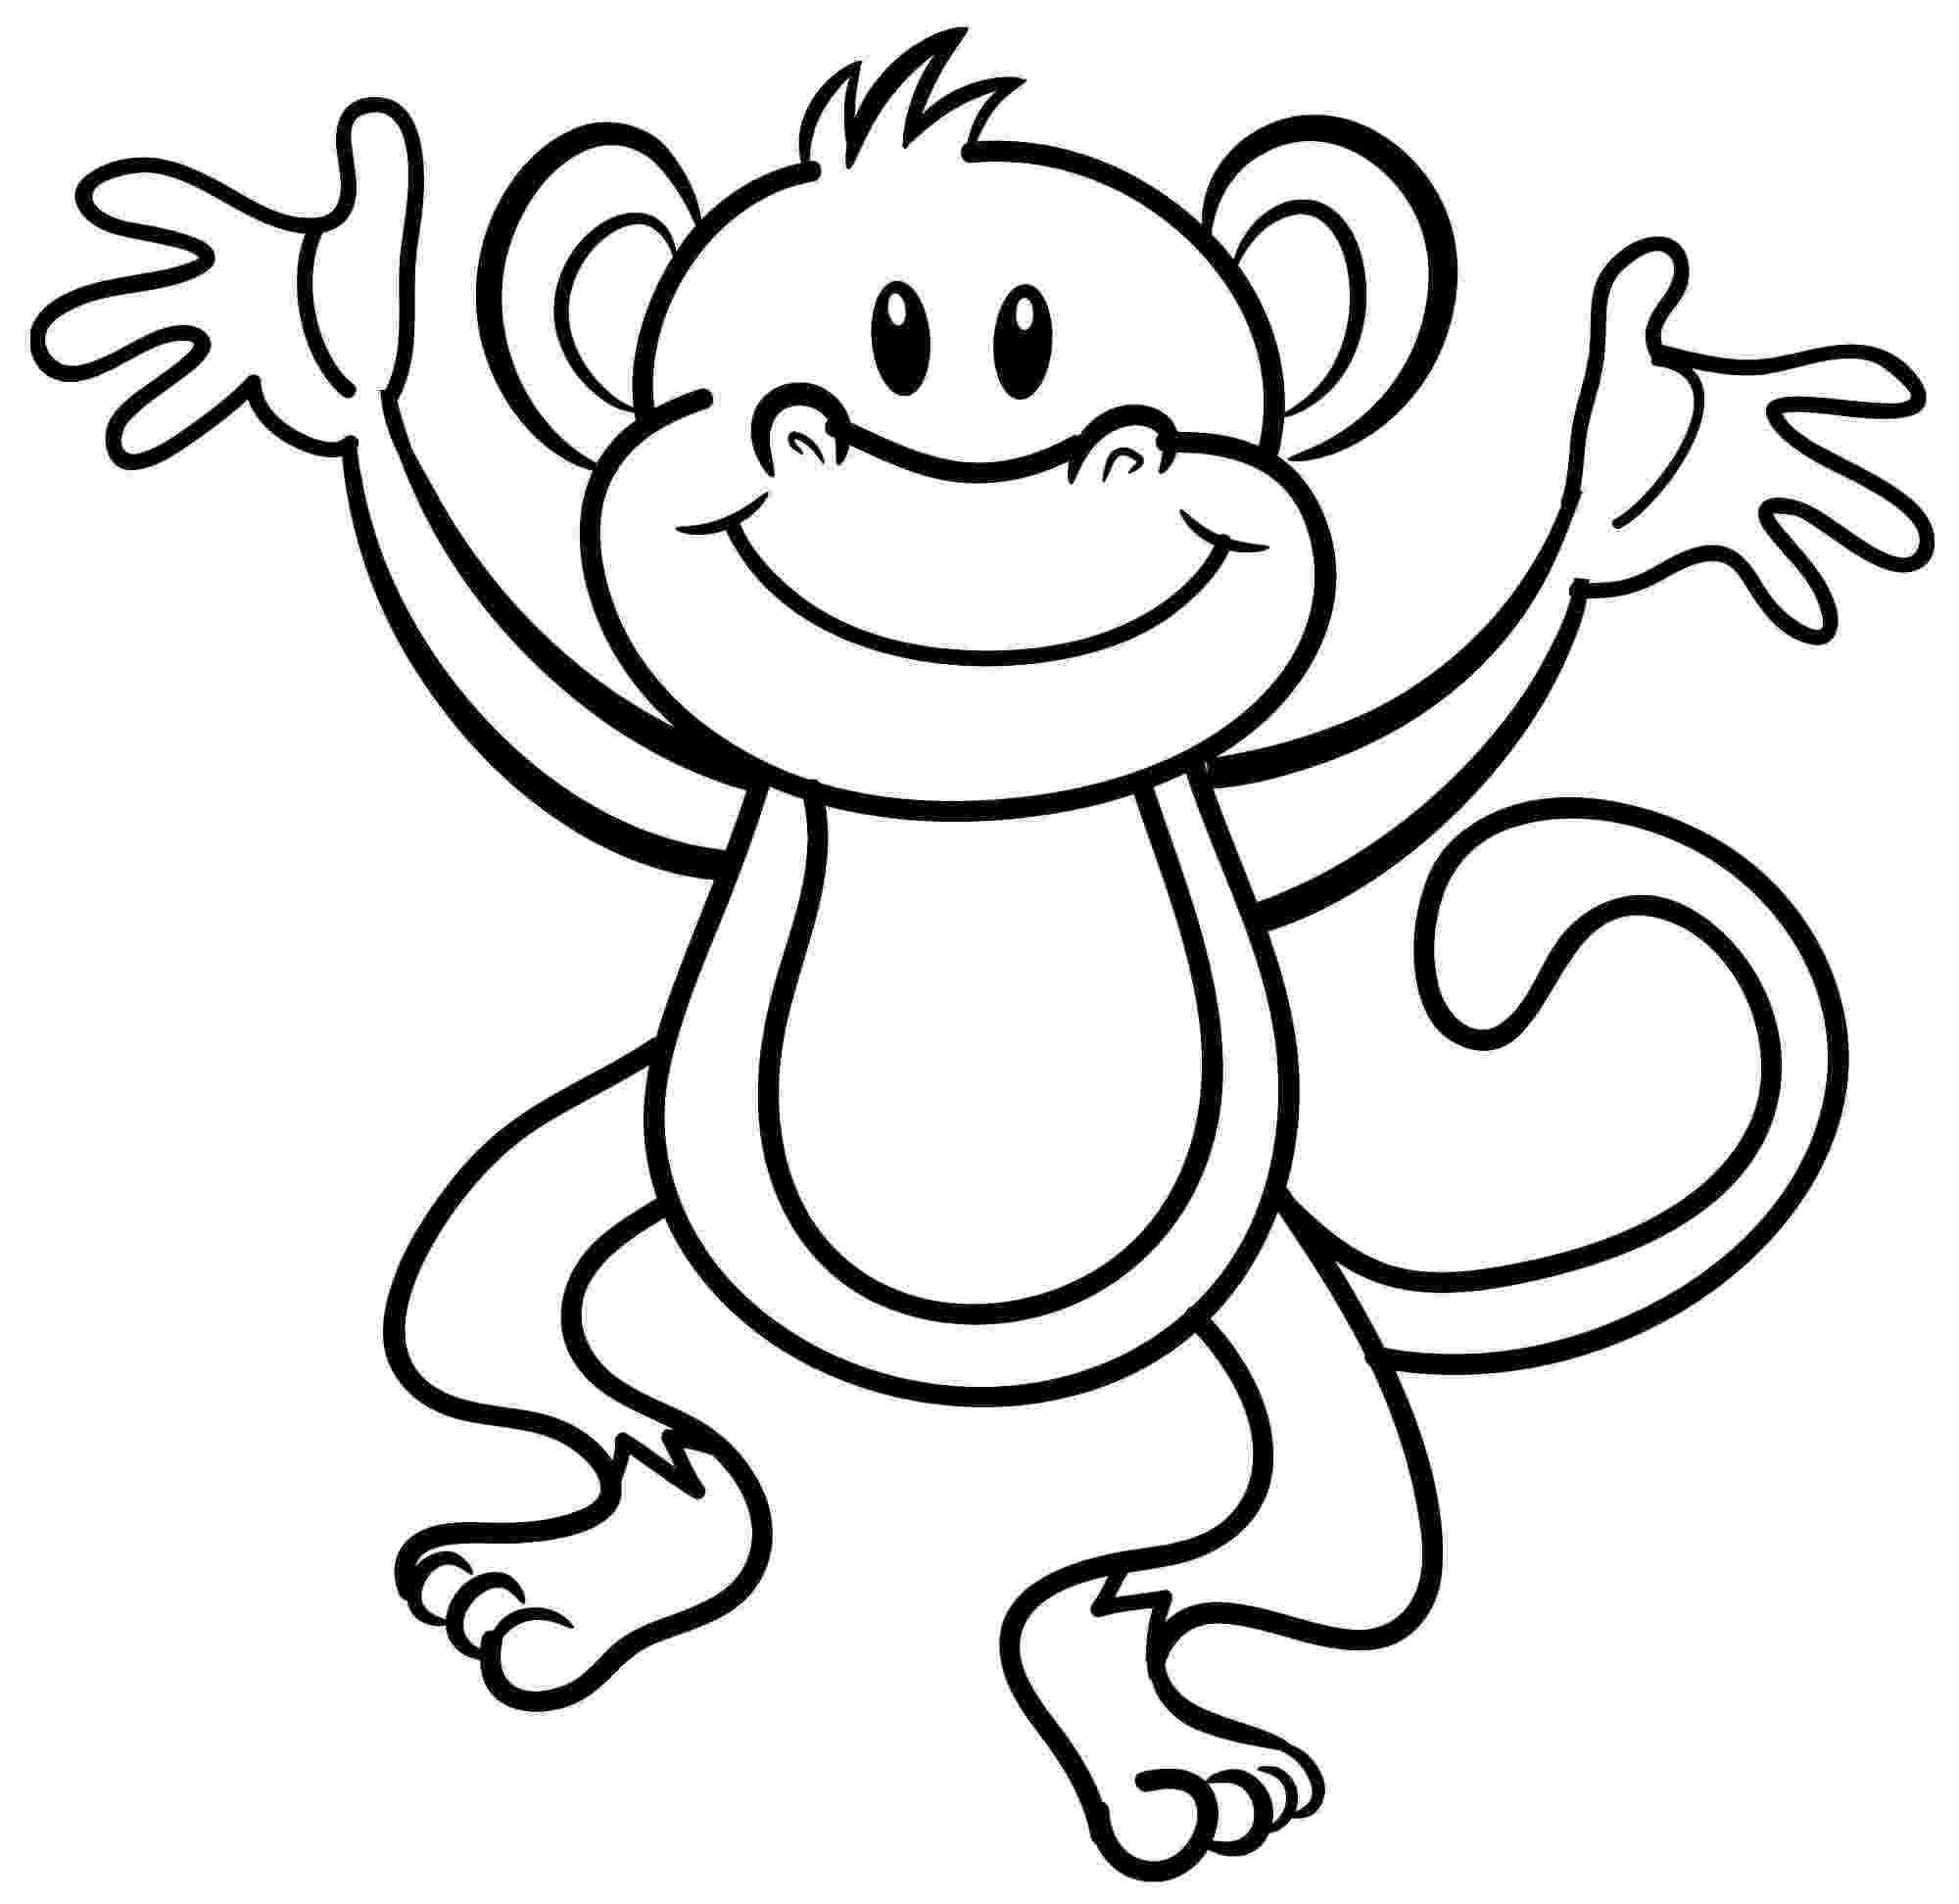 coloring animals monkey e monkey sticker ballzbeatz com homeschool printables monkey coloring animals